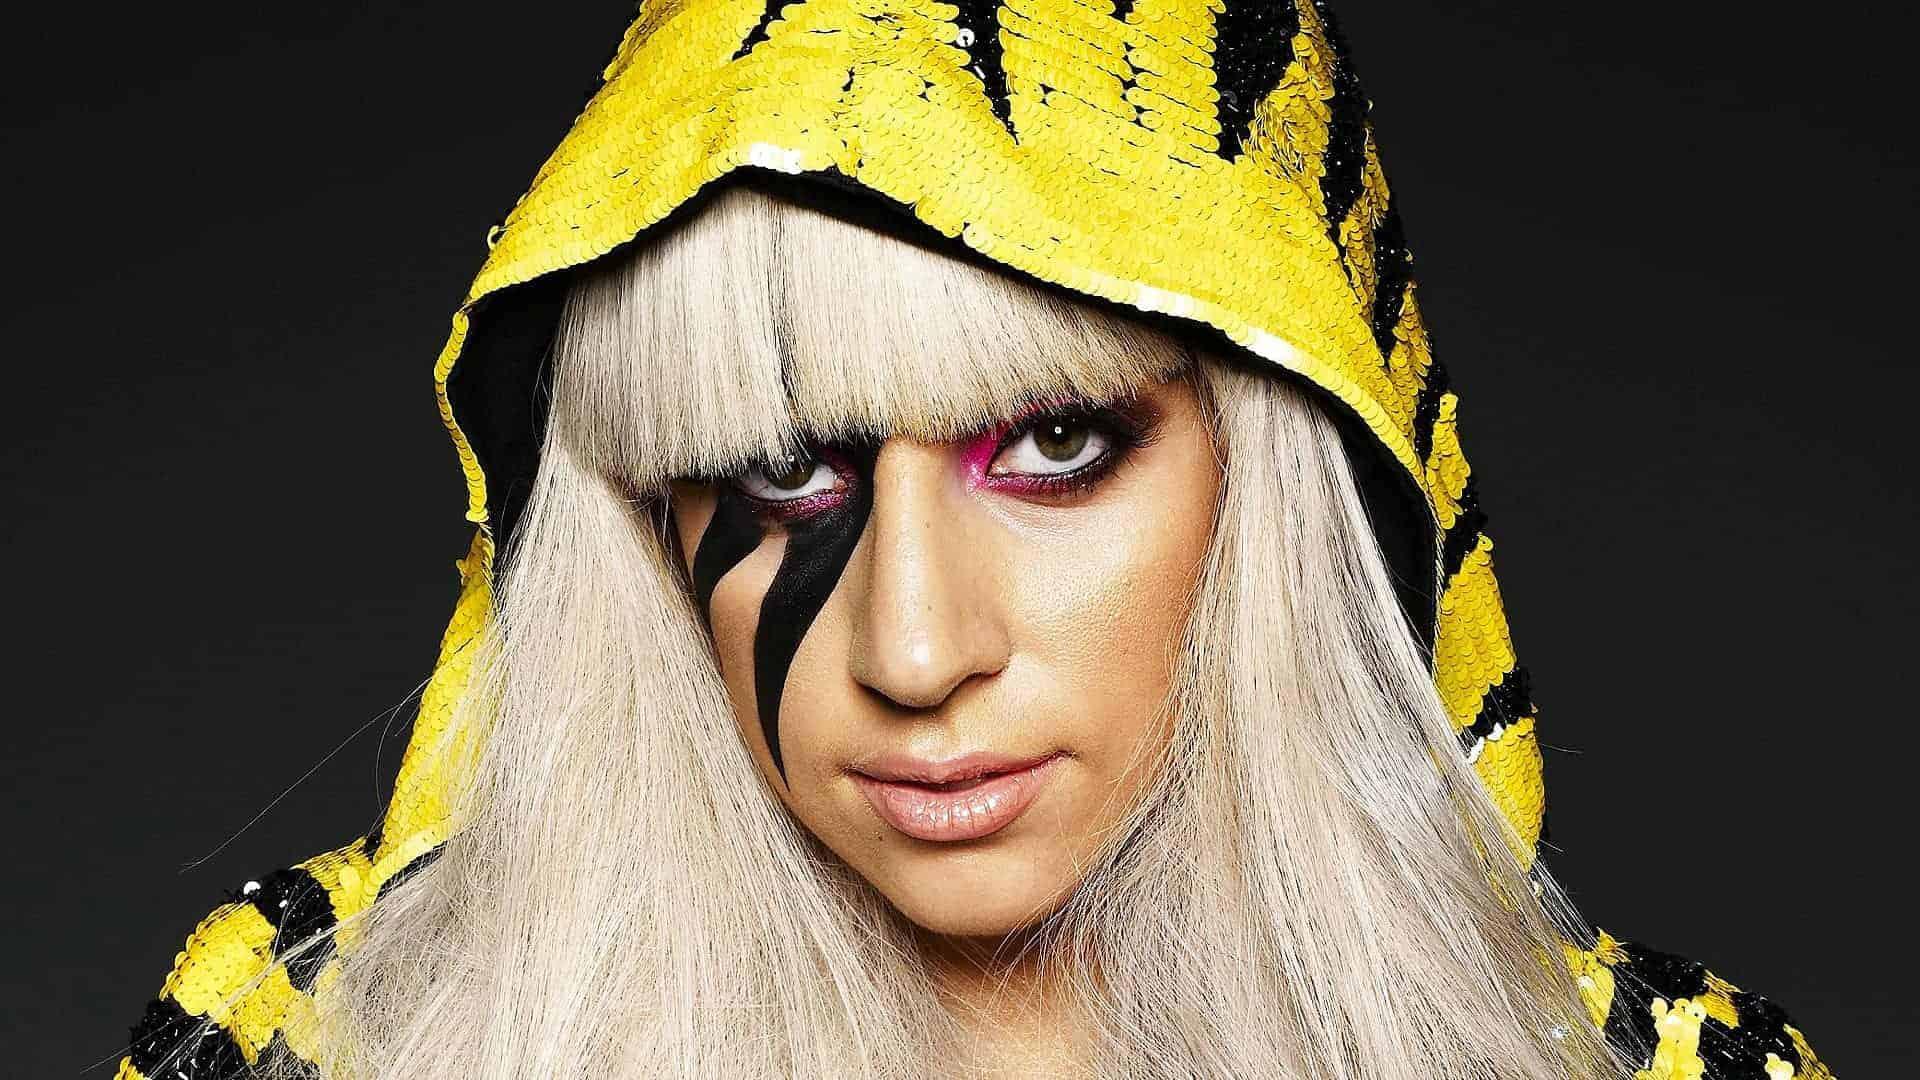 Lady Gaga Halloween Costume Ideas Homemade Lady Gaga Halloween Costume